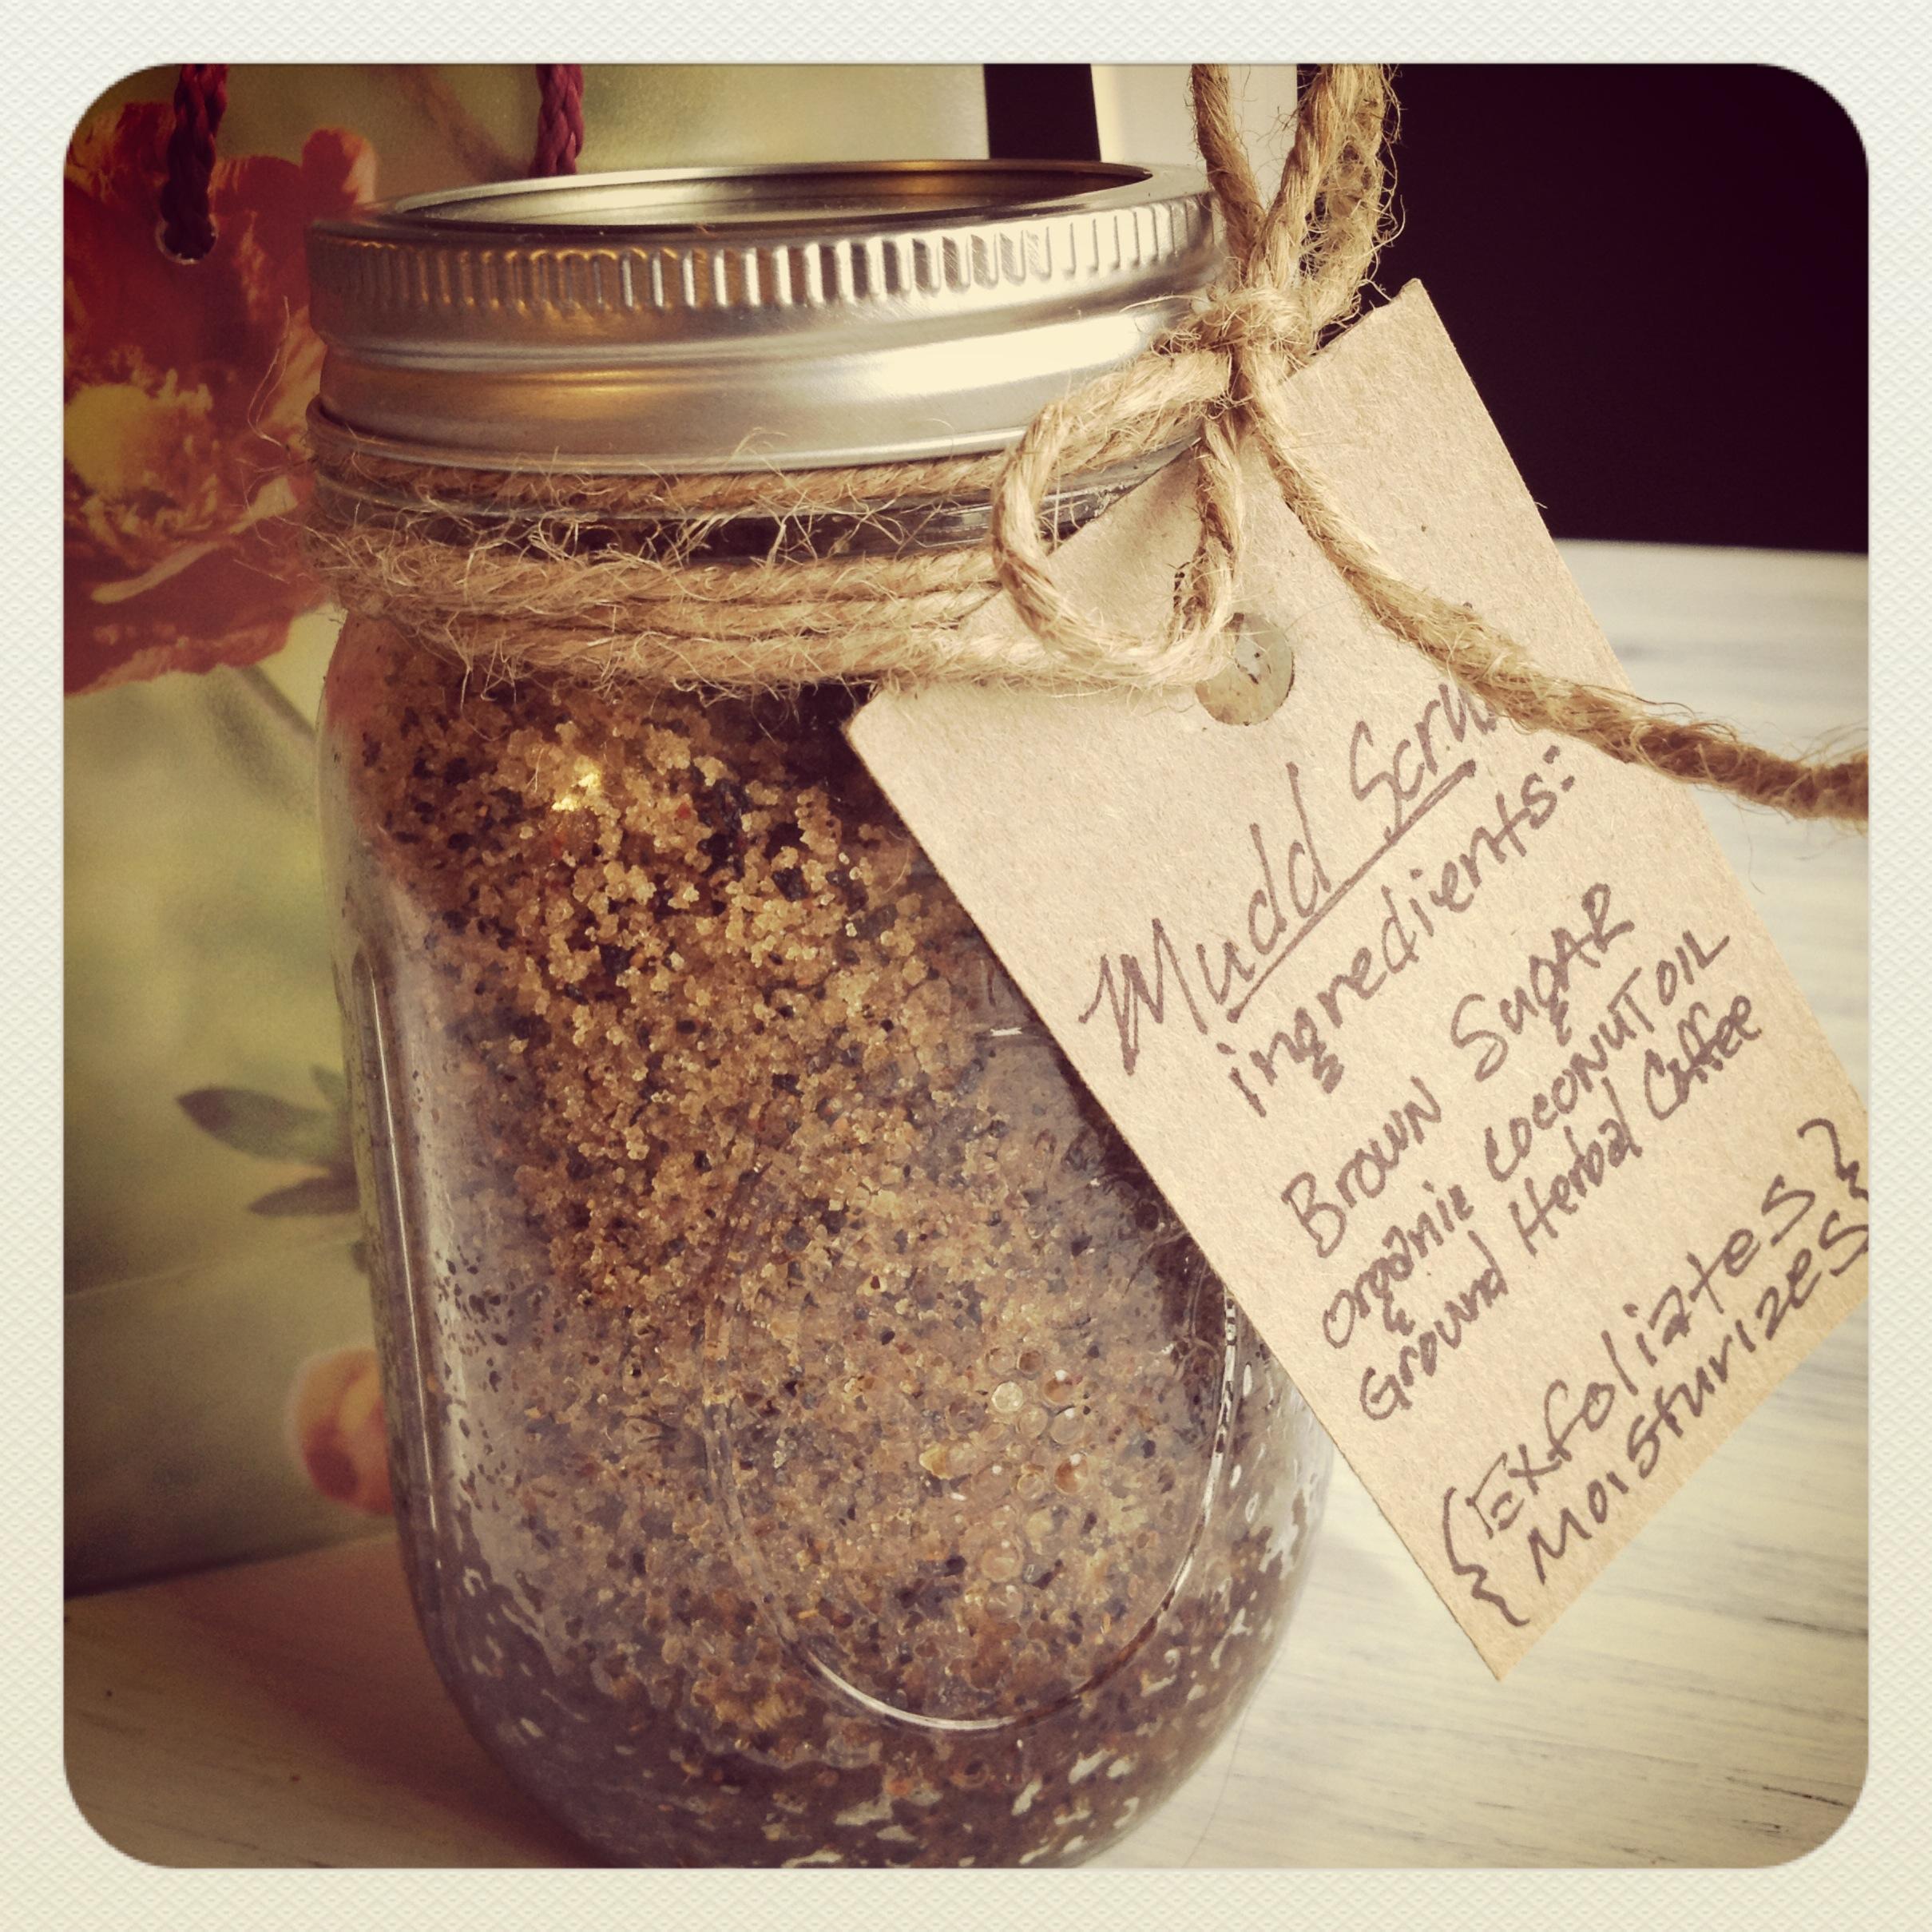 Body Scrub Recipe + Organic Coconut Oil Giveaway | A Writer's Inkhorn